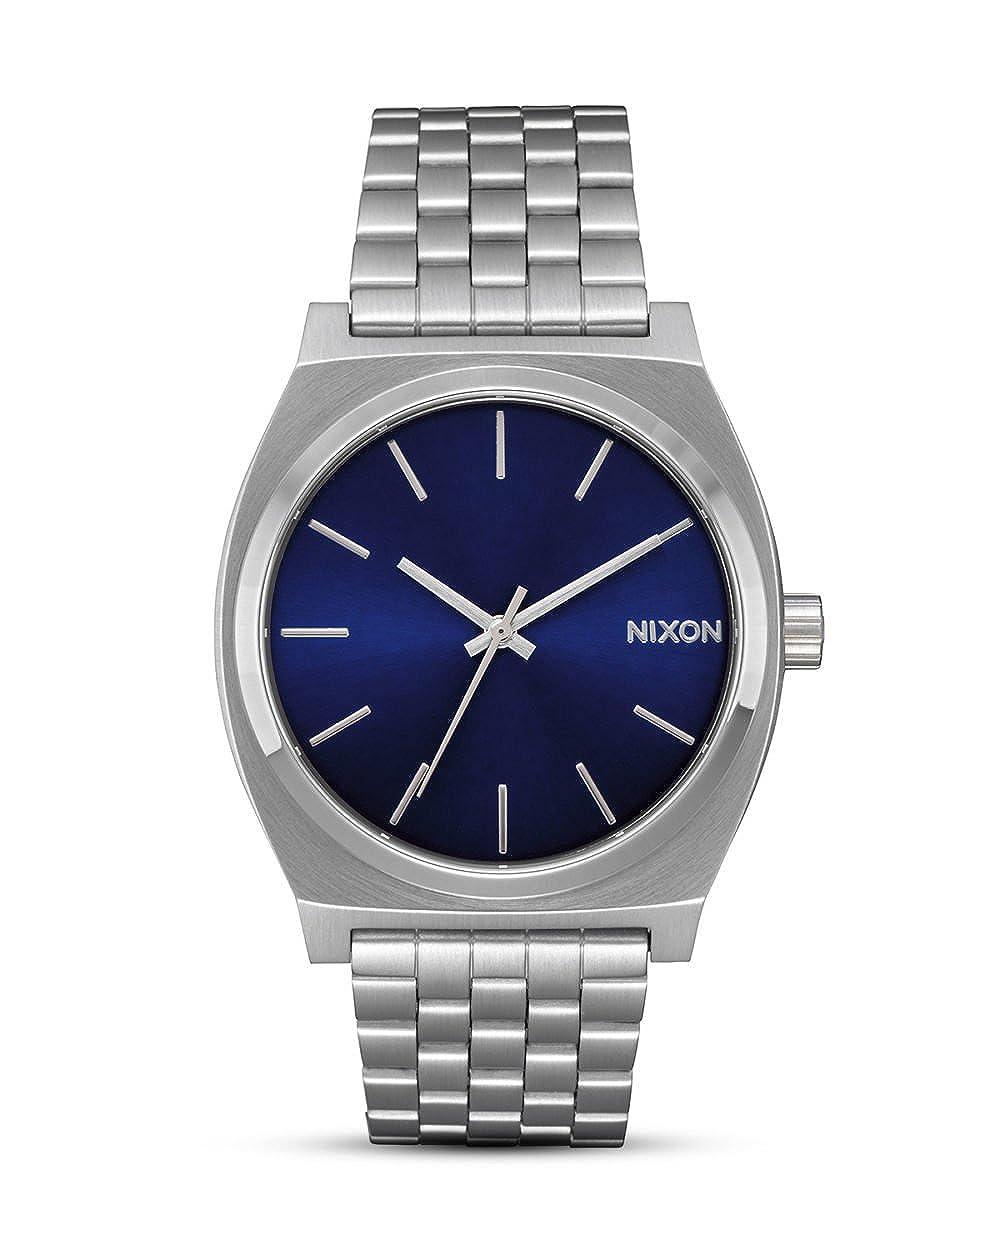 Nixon Time Teller -Spring 2017- Blue Sunray